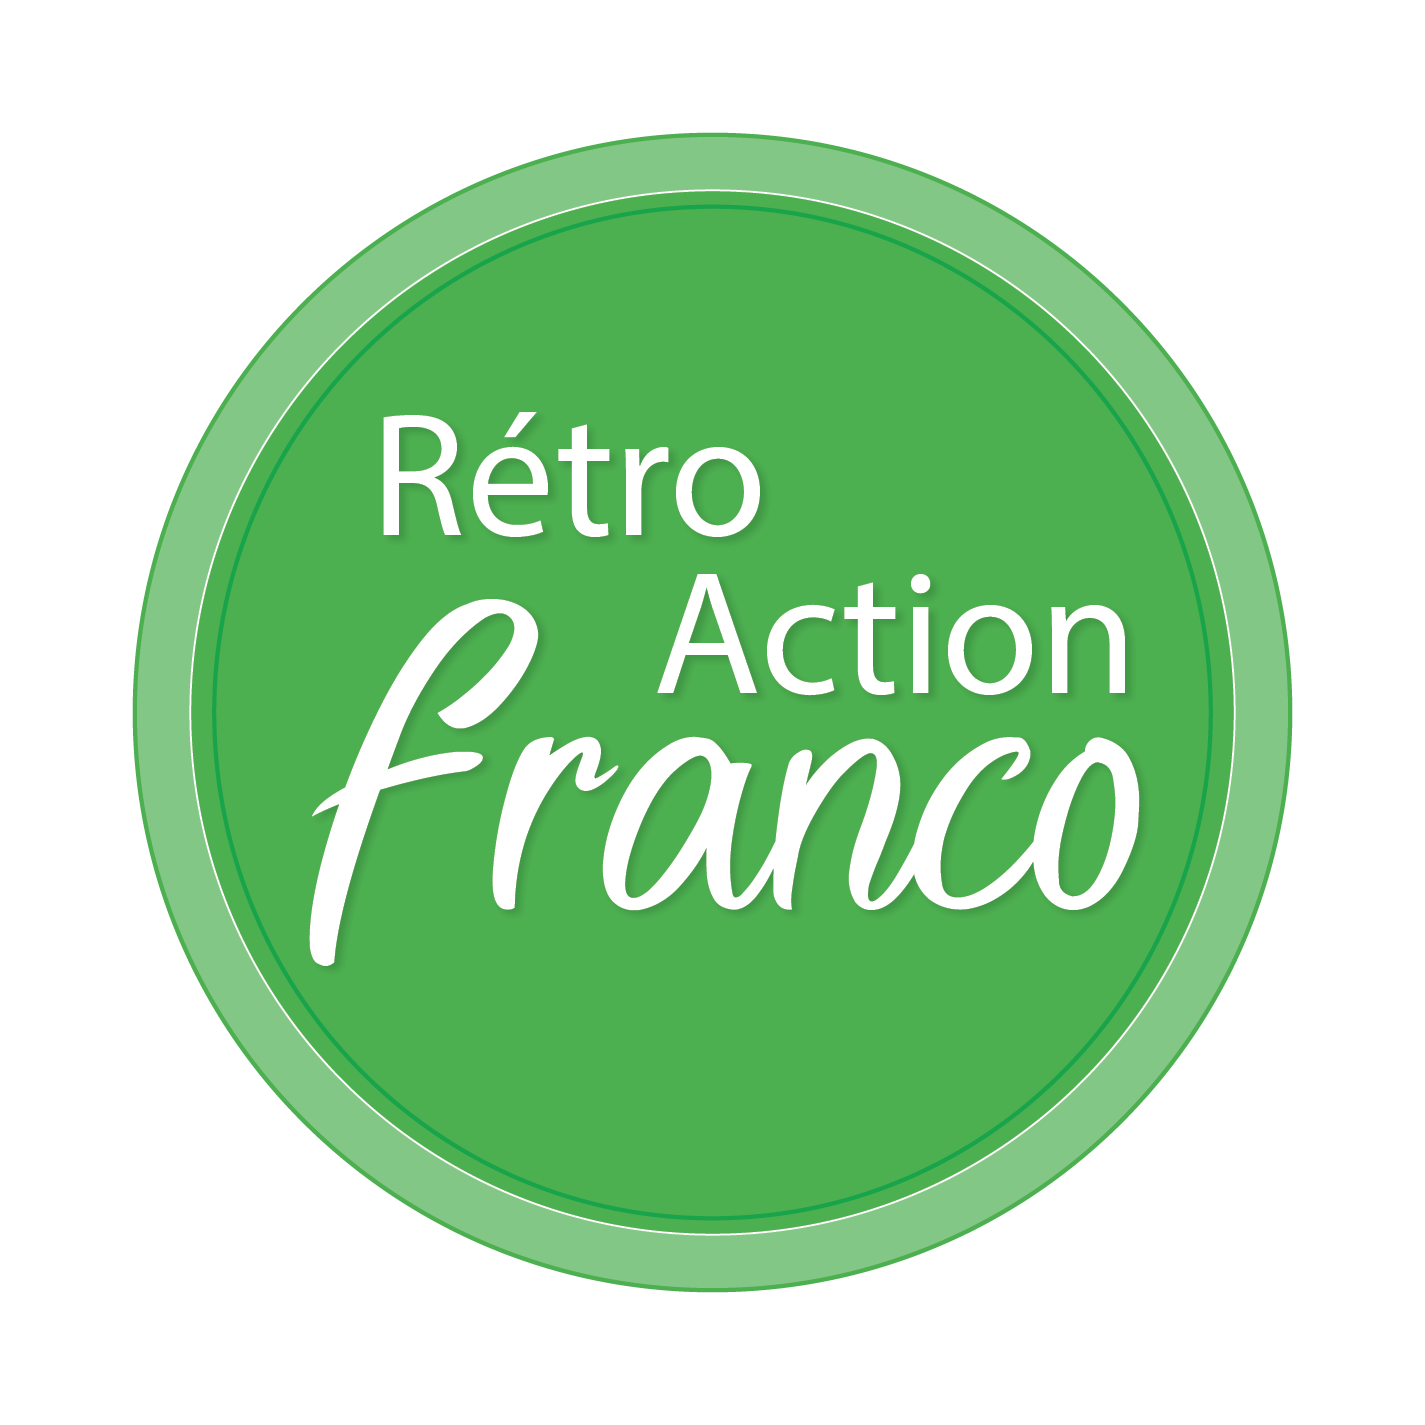 Rétro action franco